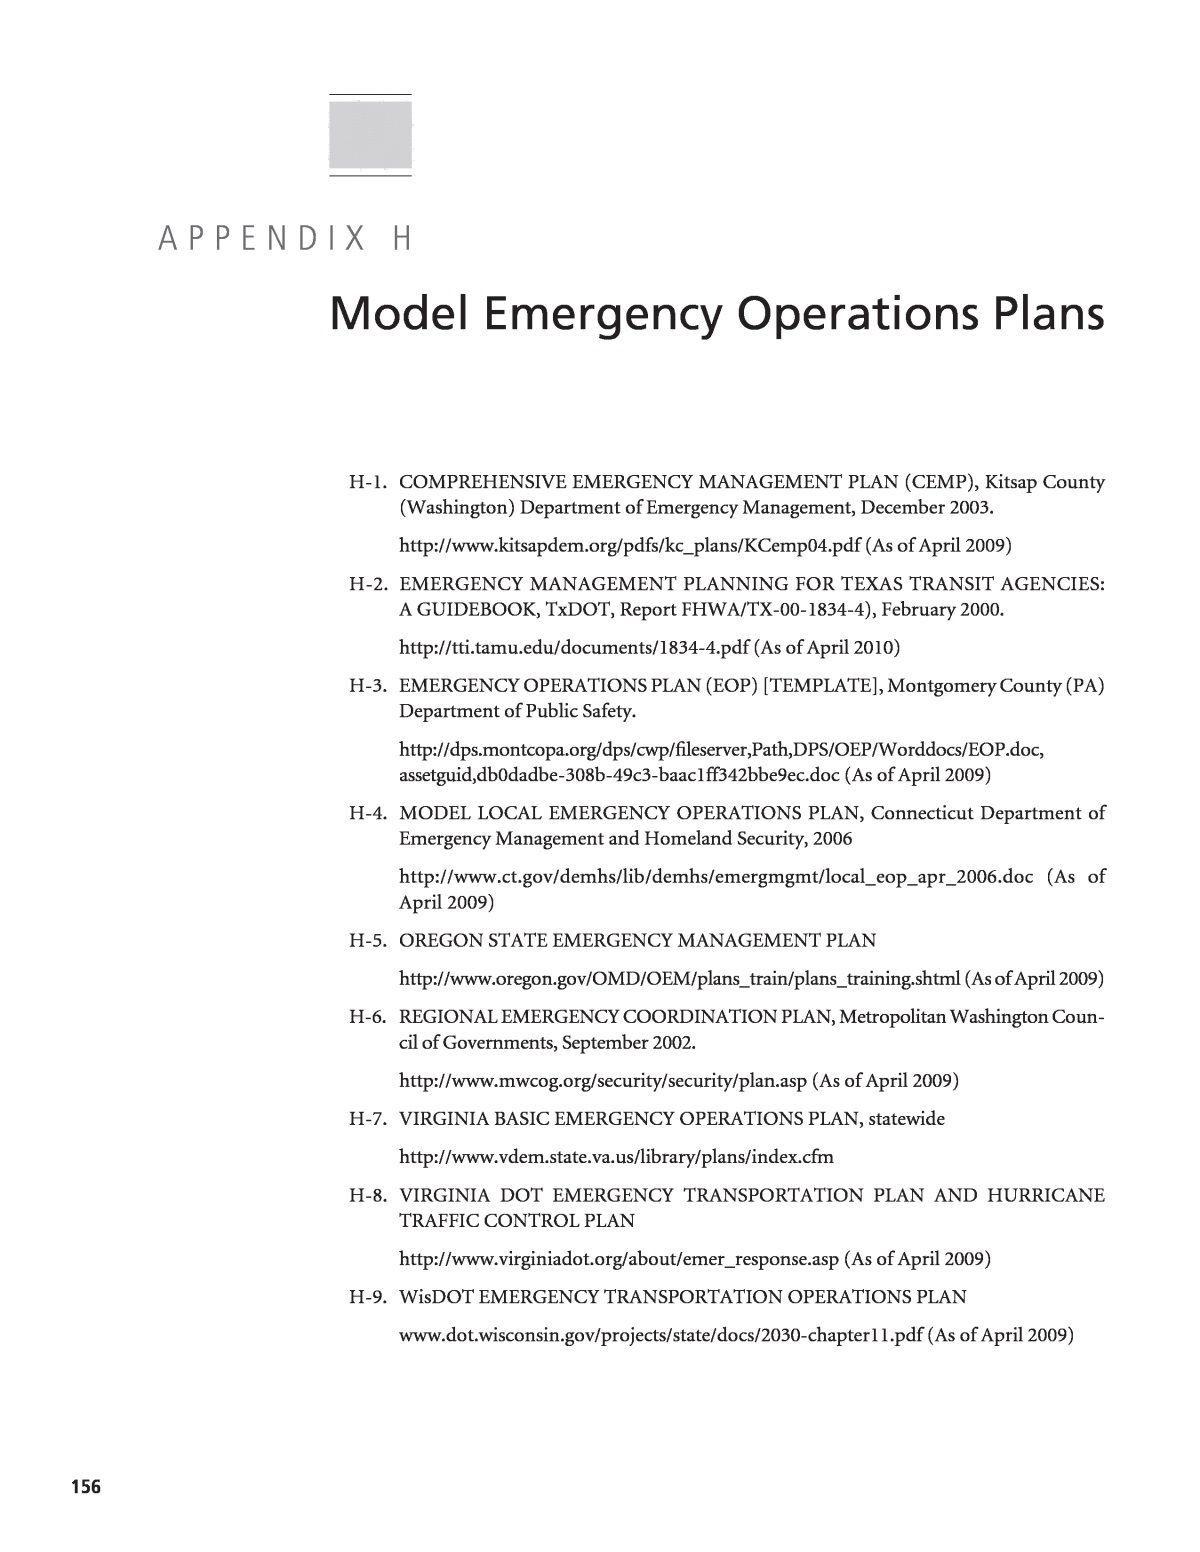 006 Unusual School Emergency Operation Plan Template Michigan Photo Full